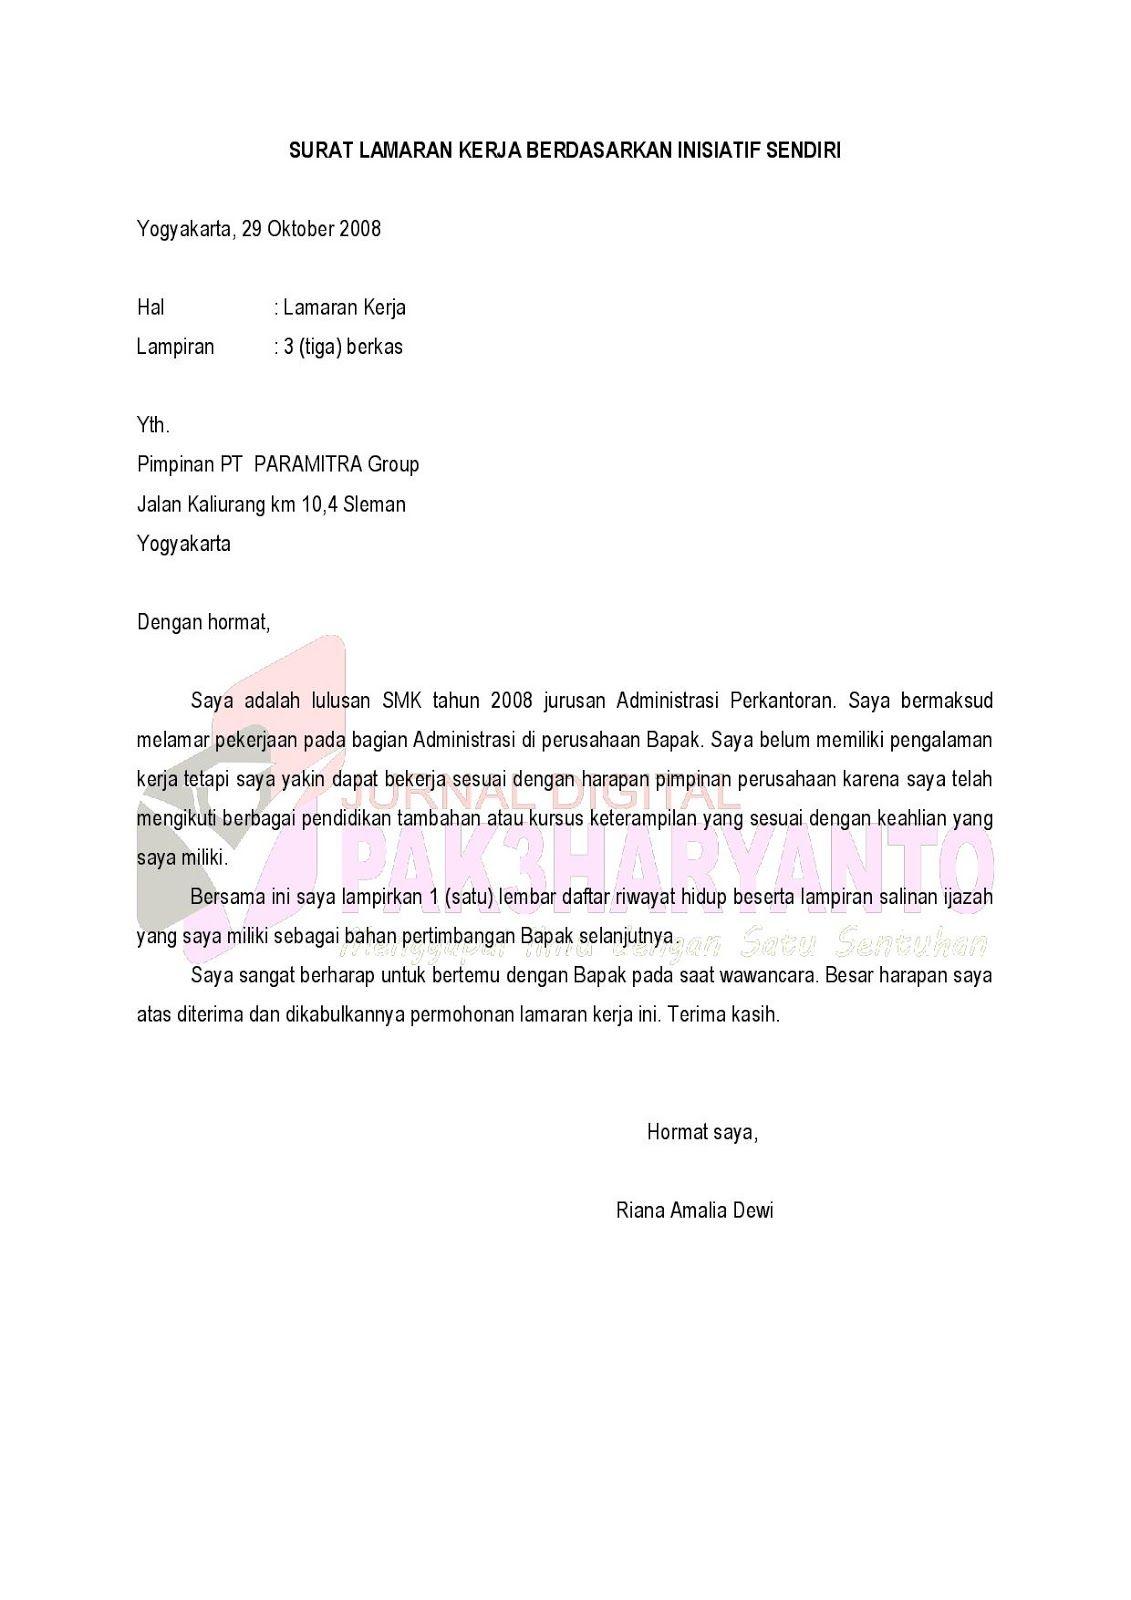 Surat Lamaran Kerja Atas Inisiatif Sendiri Ben Jobs Contoh